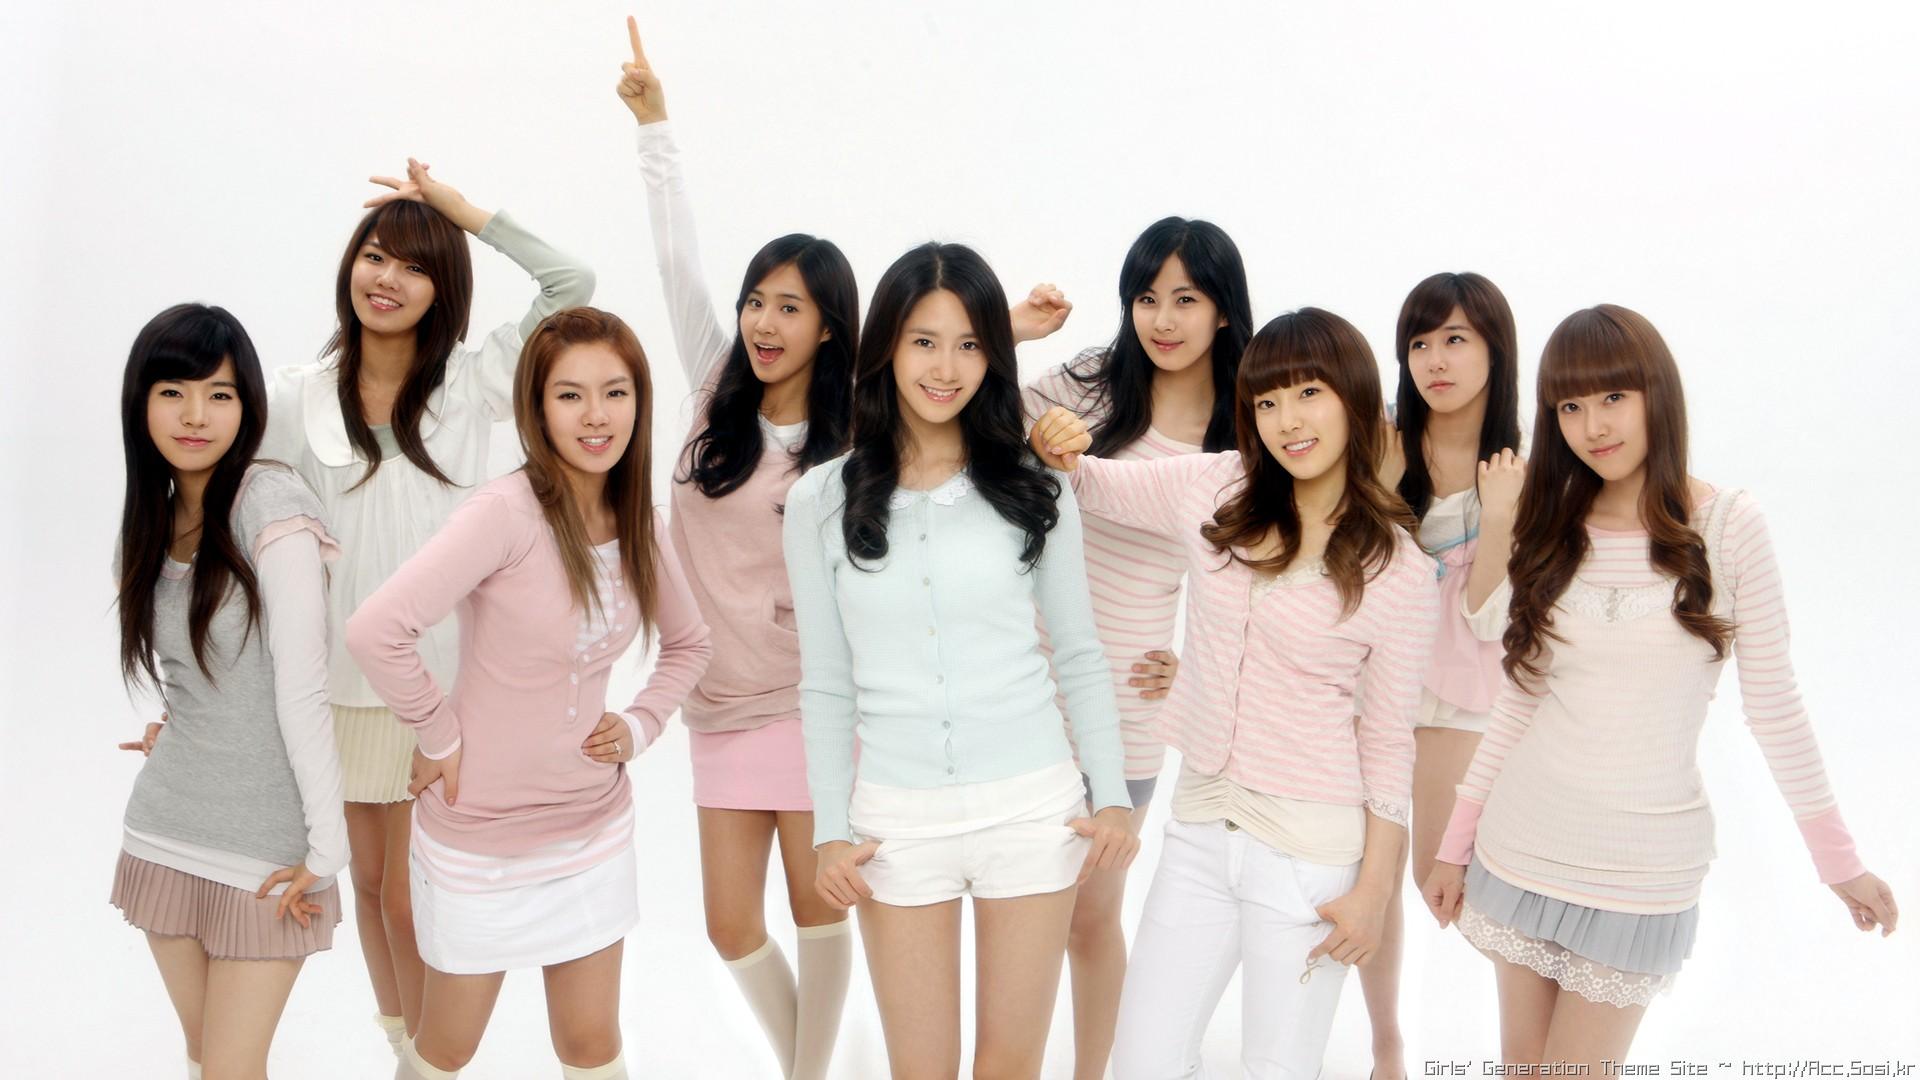 People 1920x1080 SNSD Girls' Generation Kim Taeyeon Lee Soonkyu Sunny Yoona Im Yoona Kim Hyoyeon Seohyun Tiffany Hwang Kwon Yuri Jessica Jung Choi Sooyoung women singer Asian